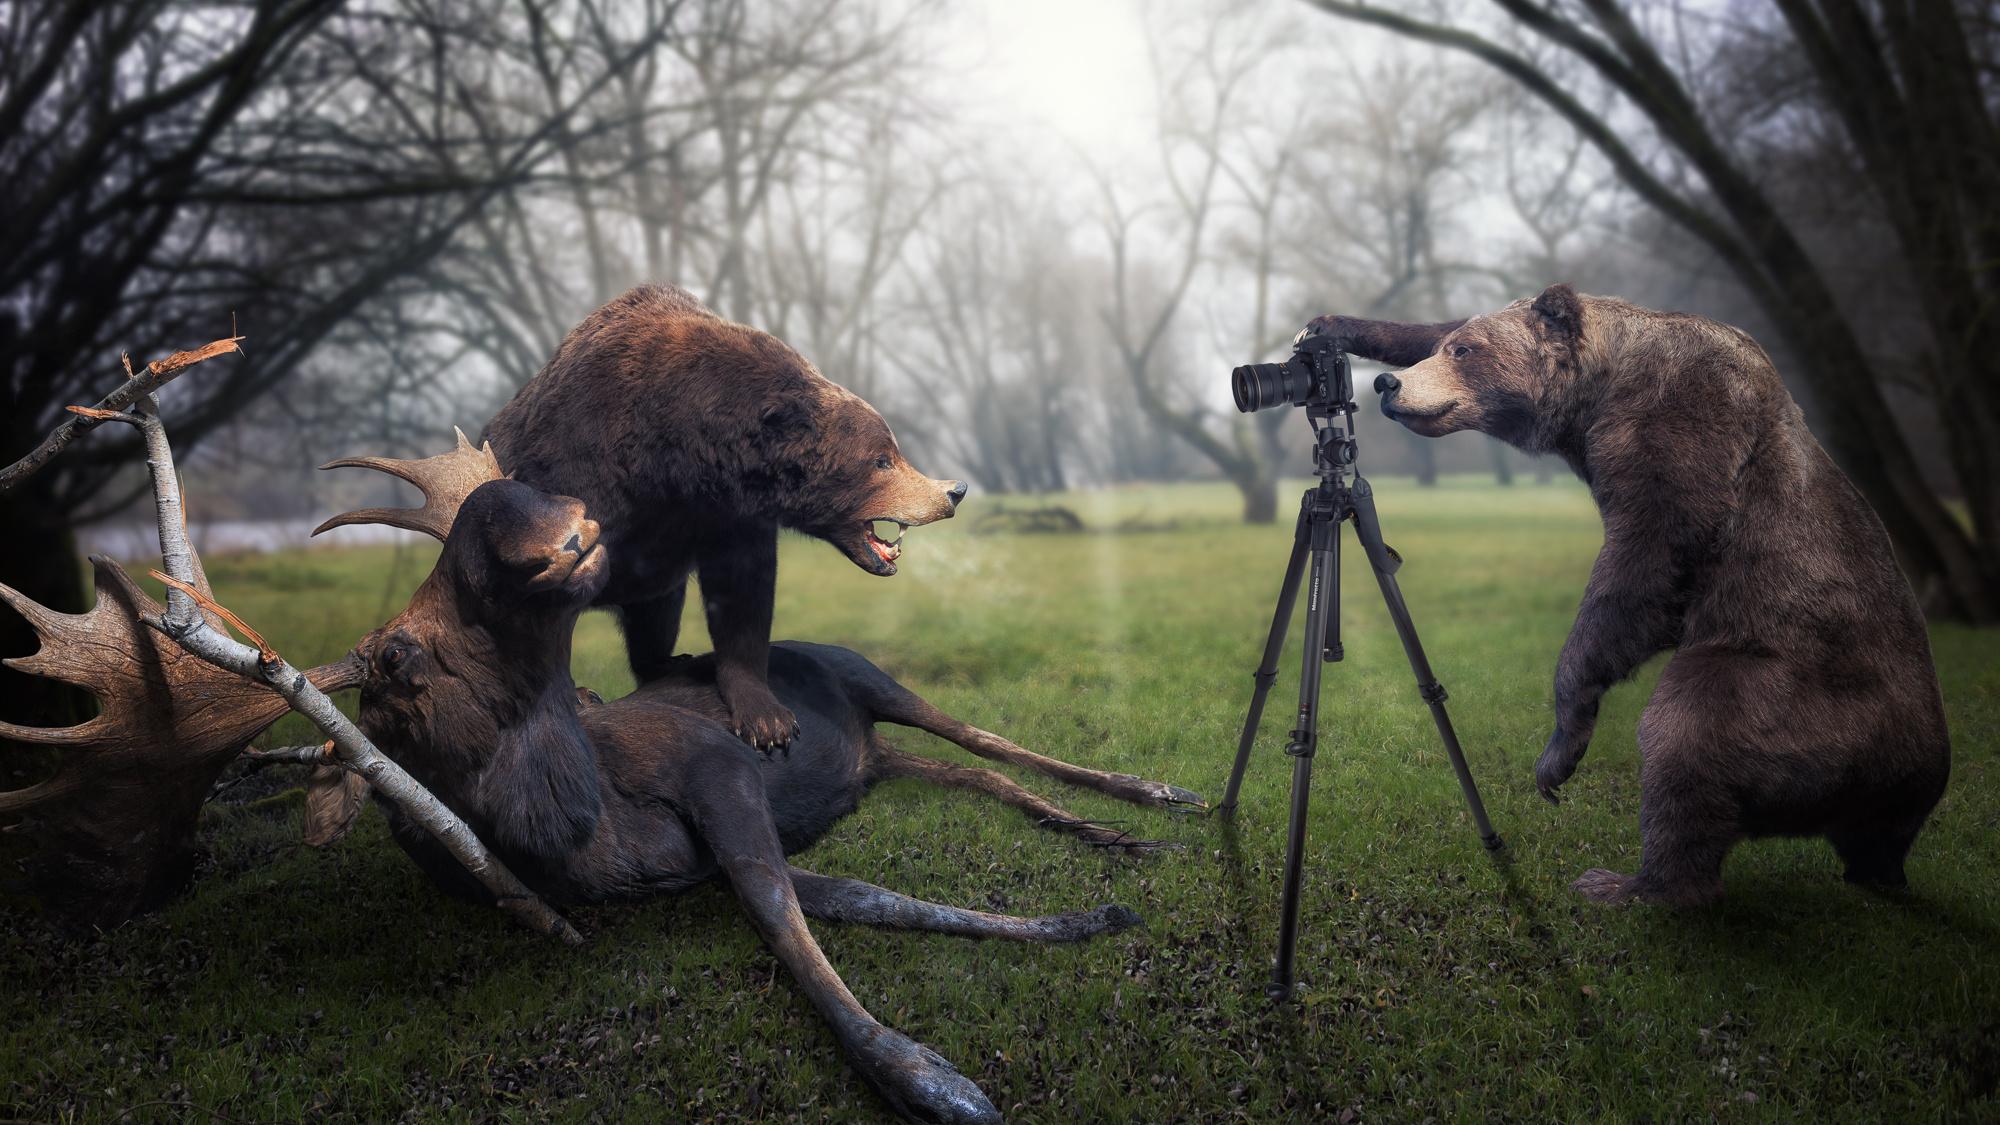 Trophy moose photographer bear wallpaper 2000x1125 228344 2000x1125